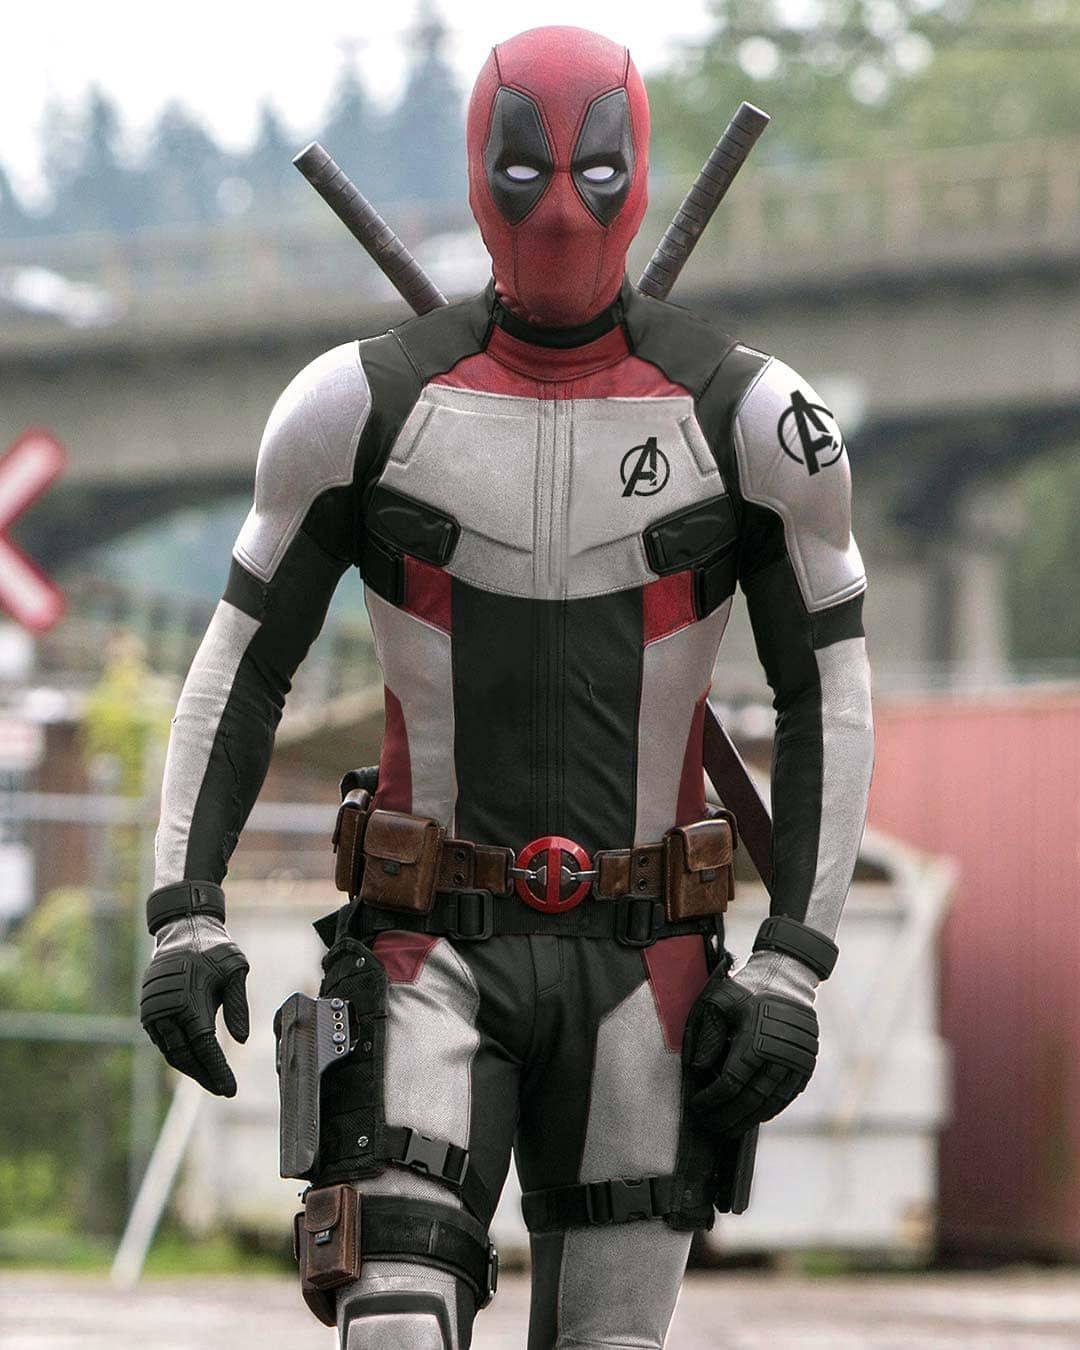 Deadpool Avengers Endgame Fan Art By Rahalarts